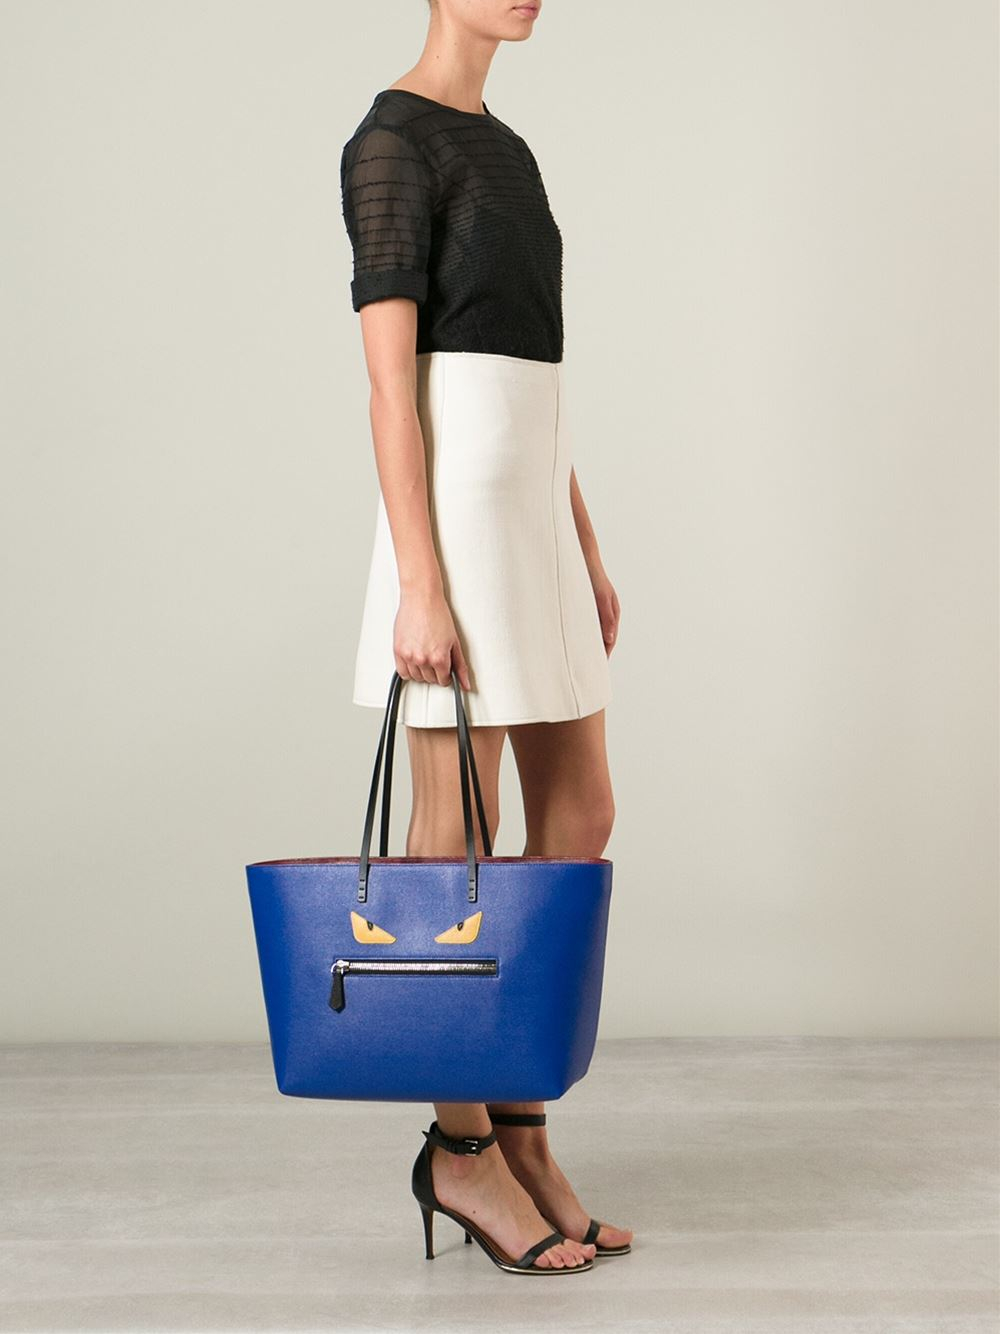 ce1ed879292d Fendi Bag Bugs  Roll  Tote Bag in Blue - Lyst